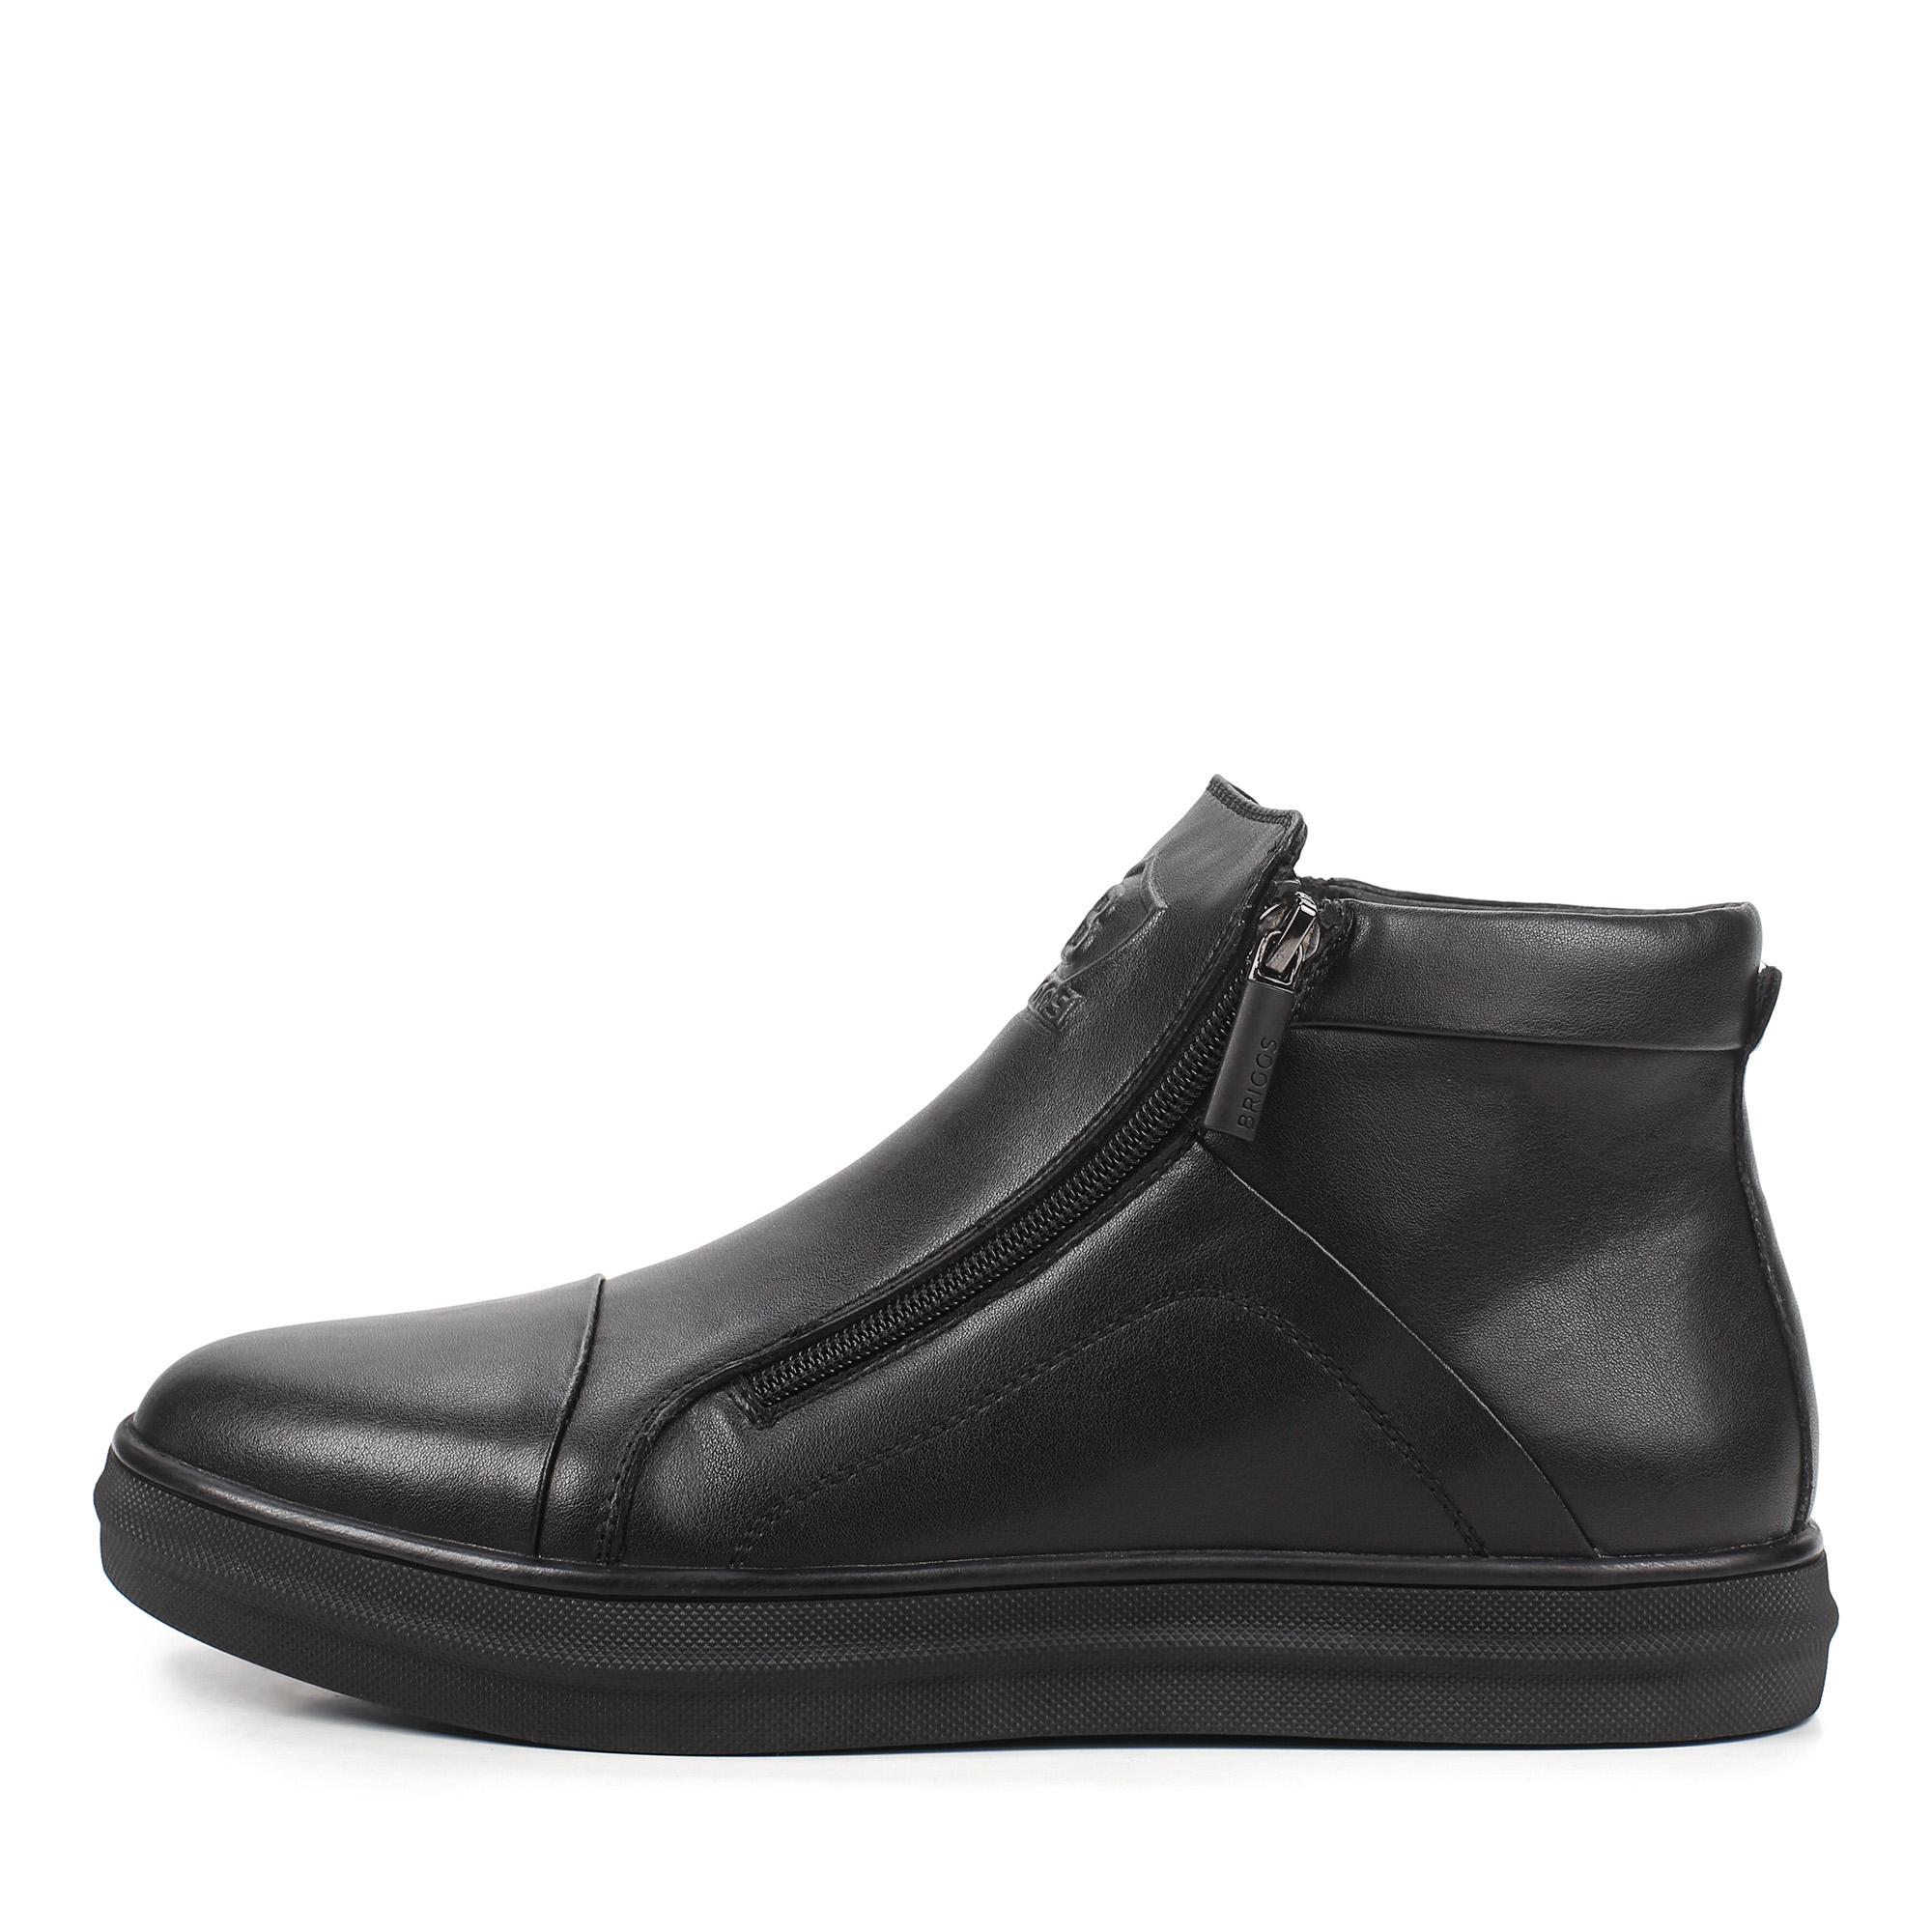 Ботинки BRIGGS 104-367B-26020